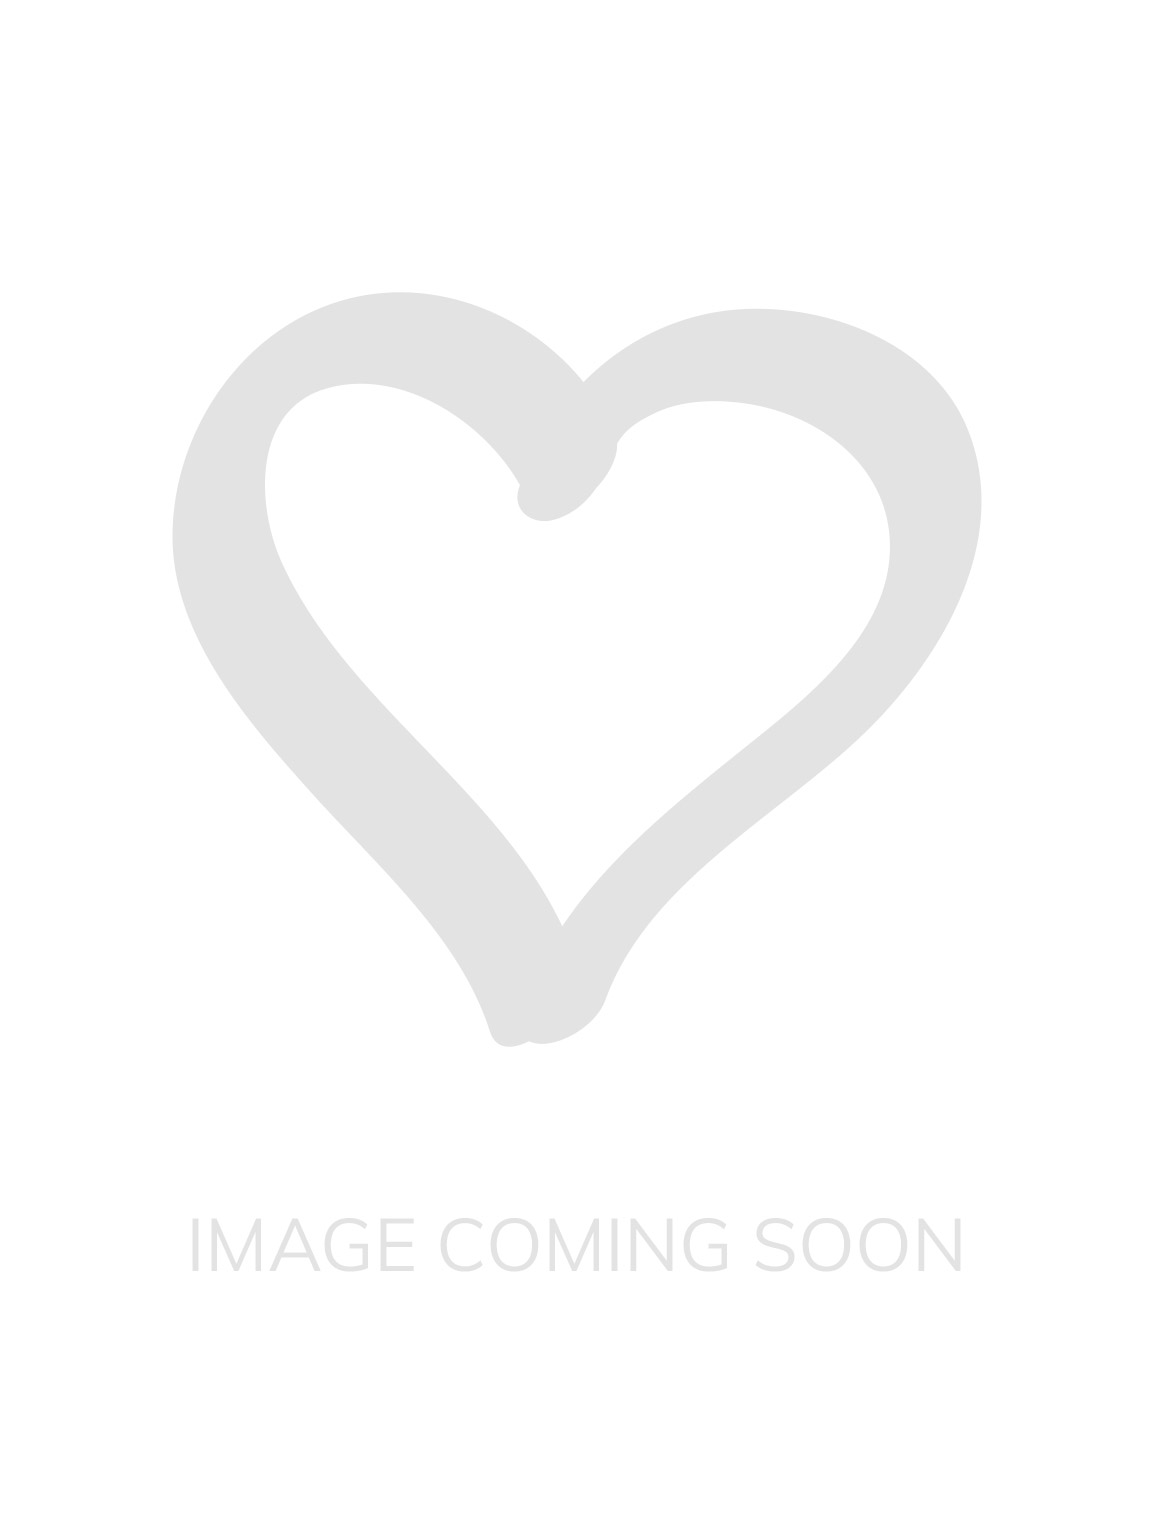 5a6a4bd76e Bloom Sheer Lace Longline Bra - Black